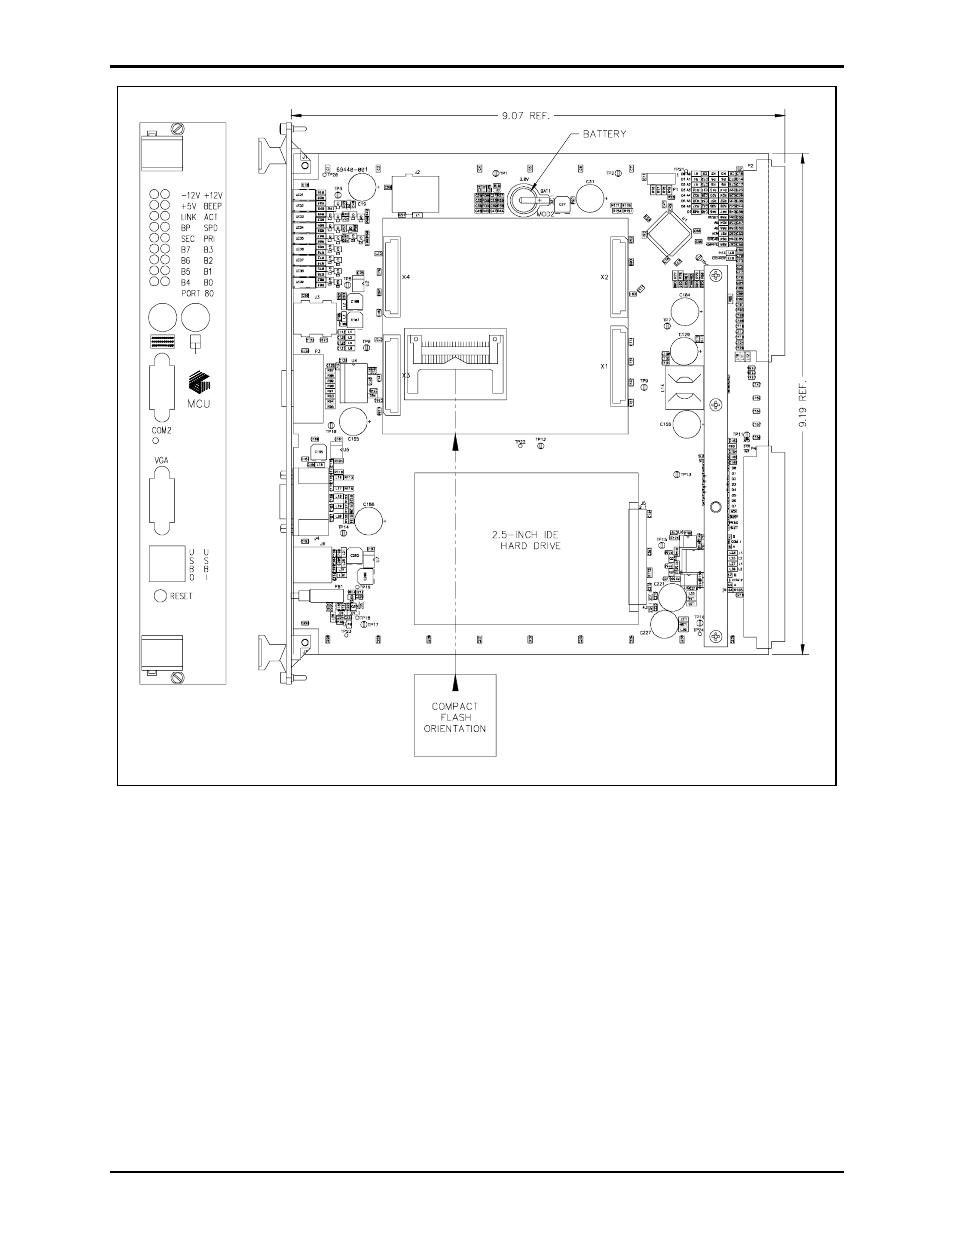 GAI-Tronics 69440-001 Master Control Unit PCBA (MCU) User